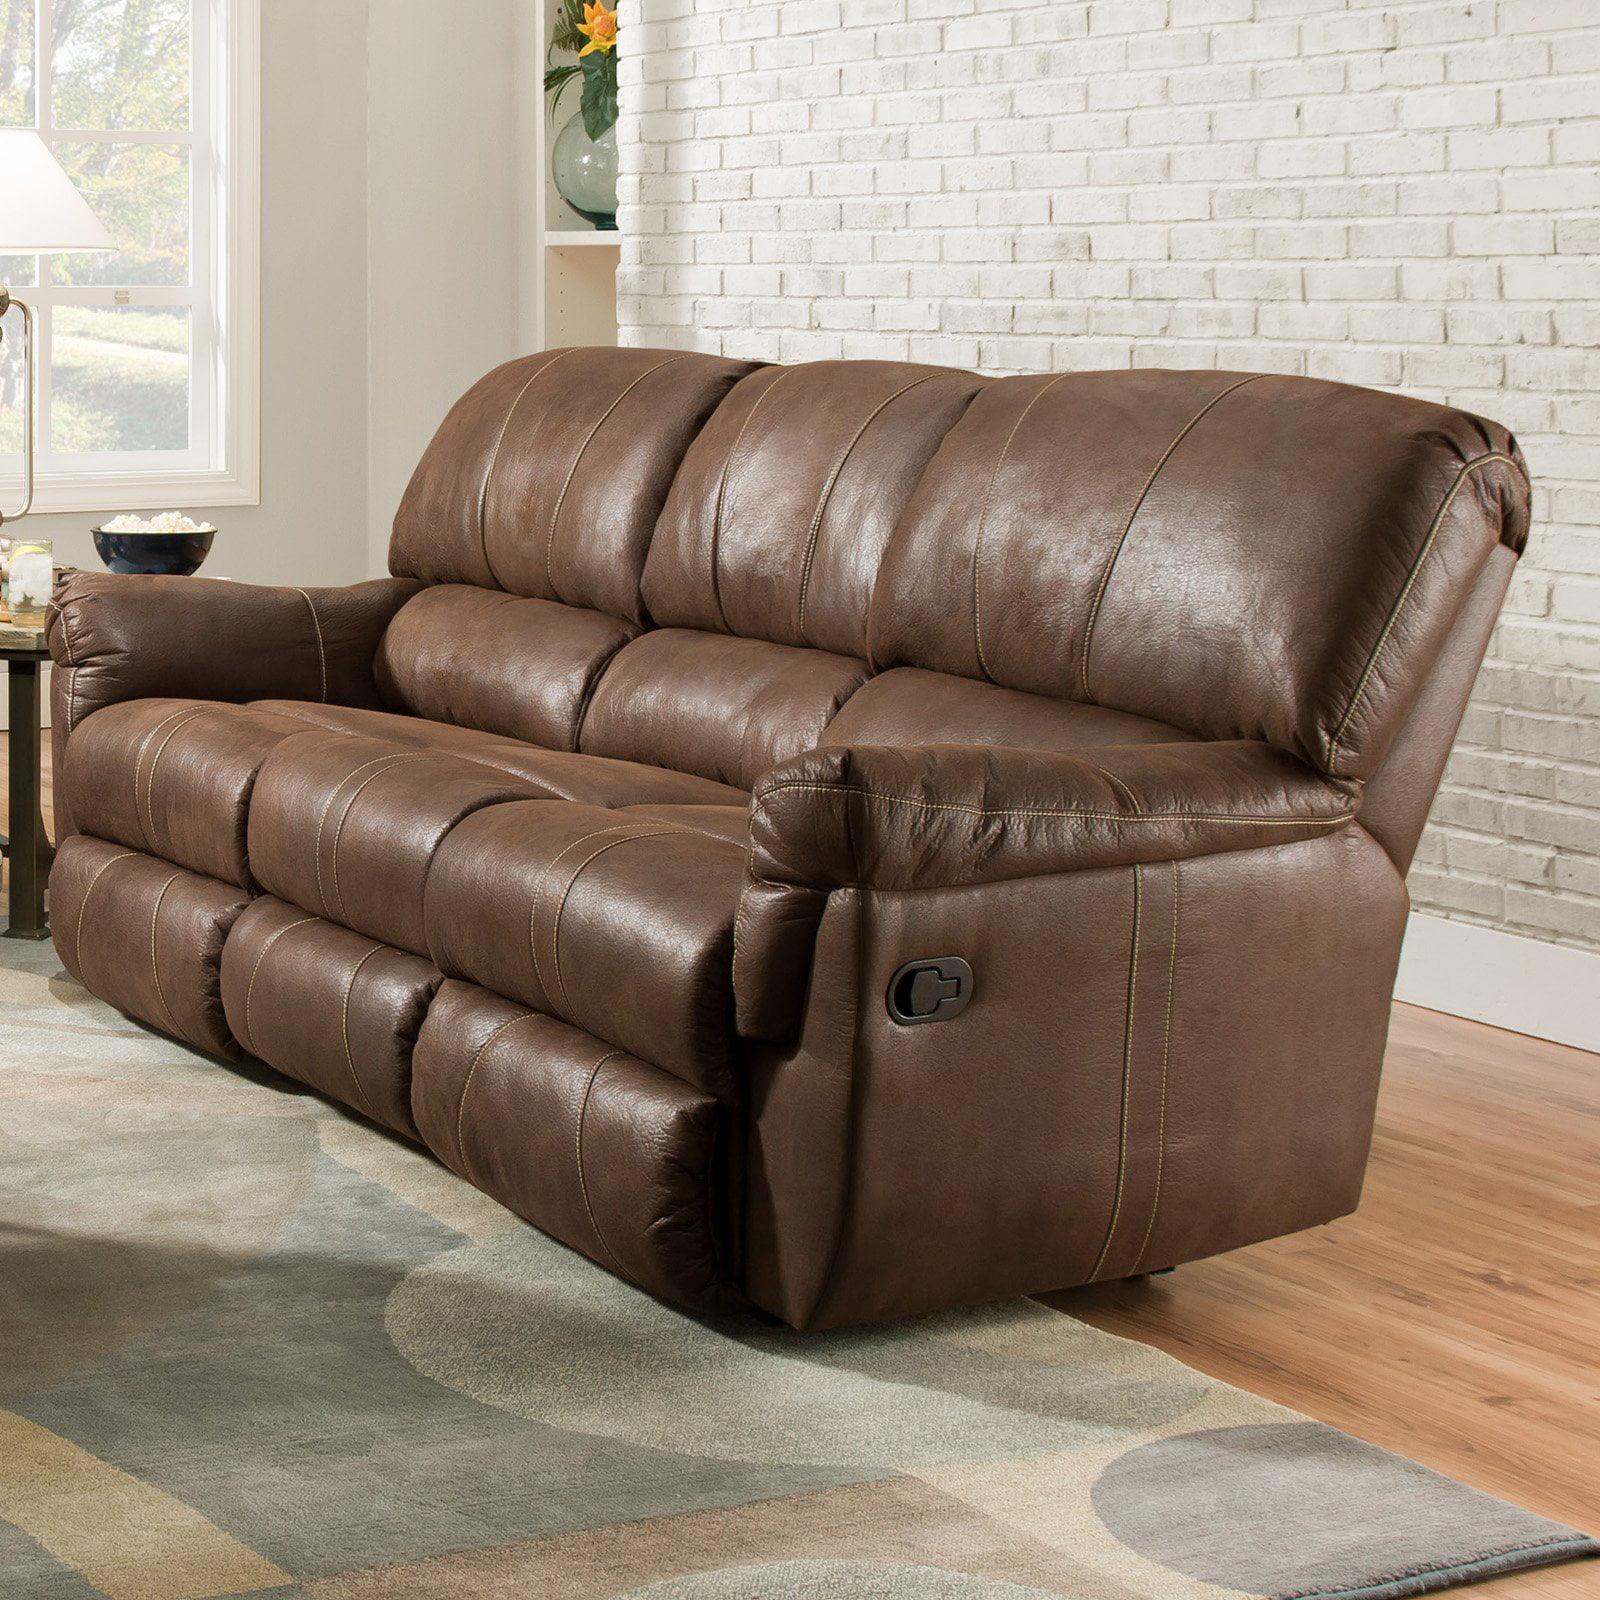 Simmons Upholstery Renegade Beautyrest Sofa   Mocha   Walmart.com